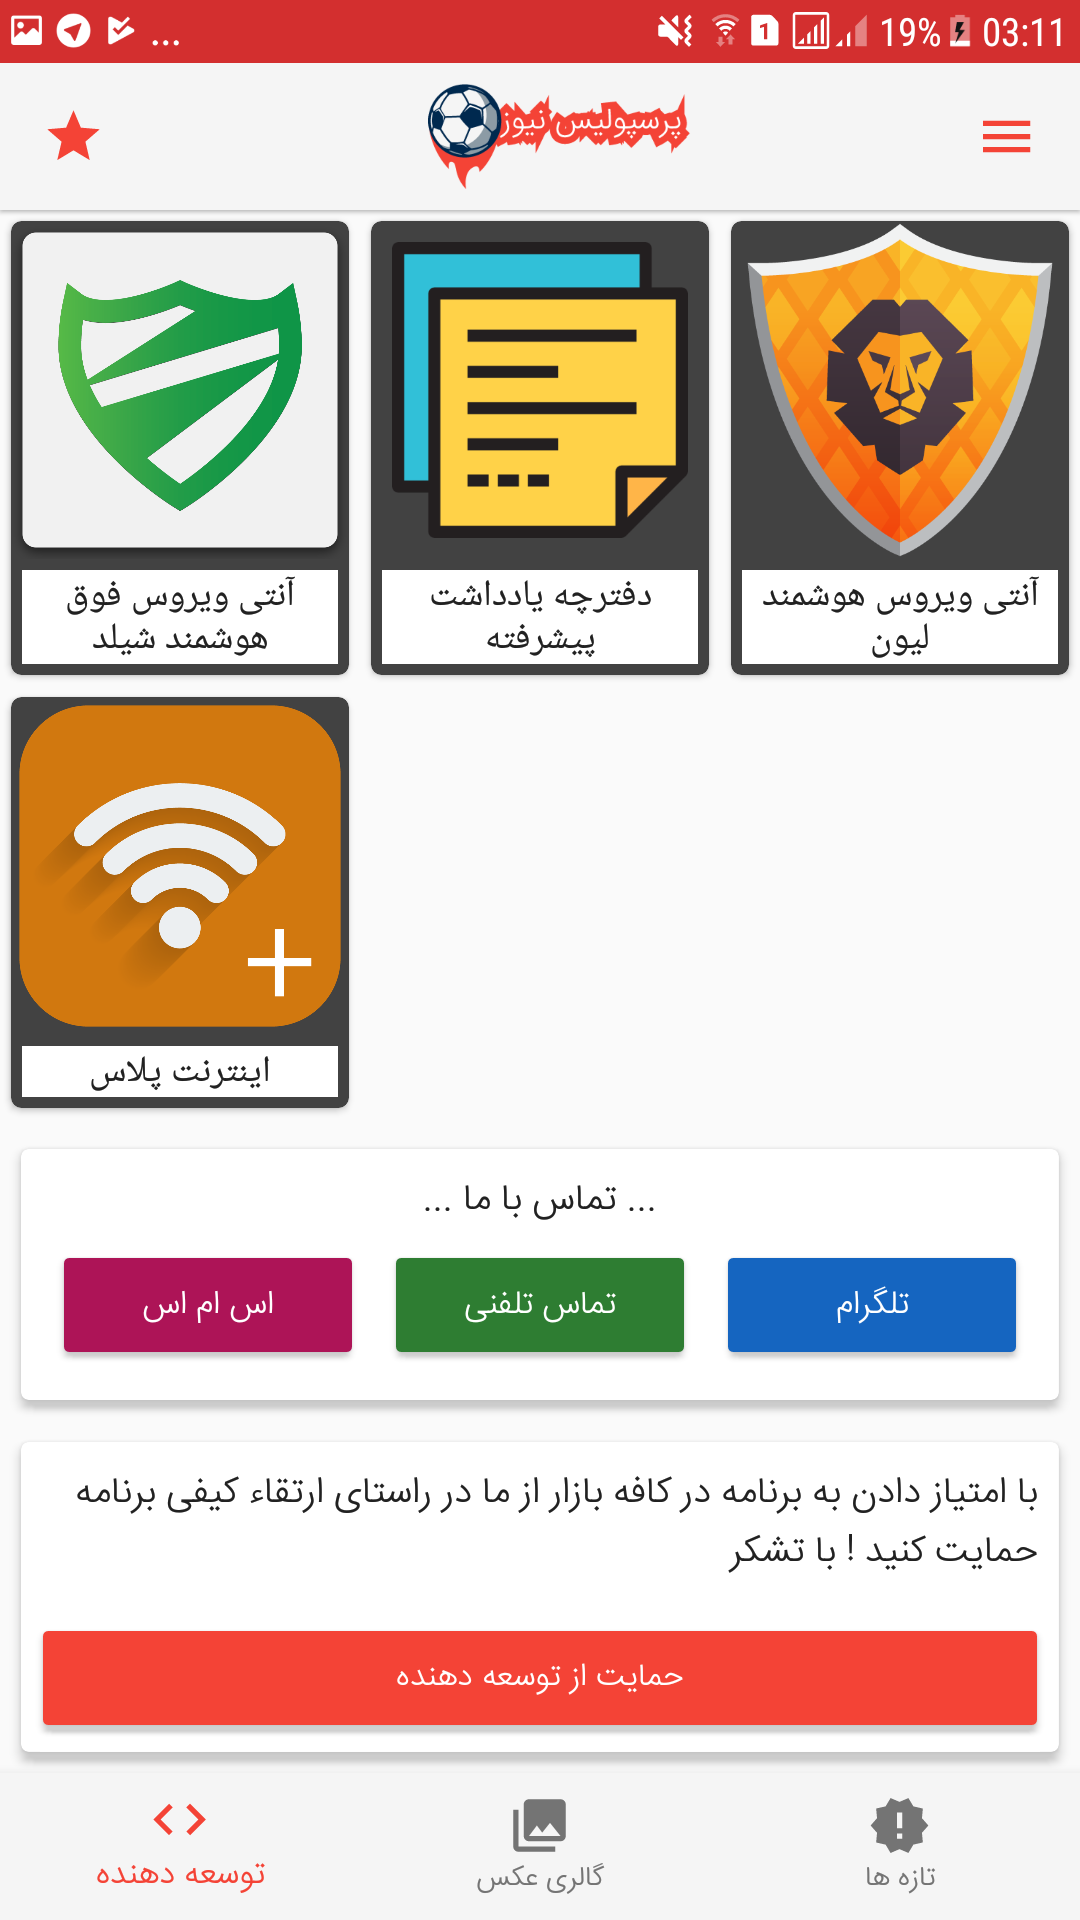 Screenshot_20171005_031111.png